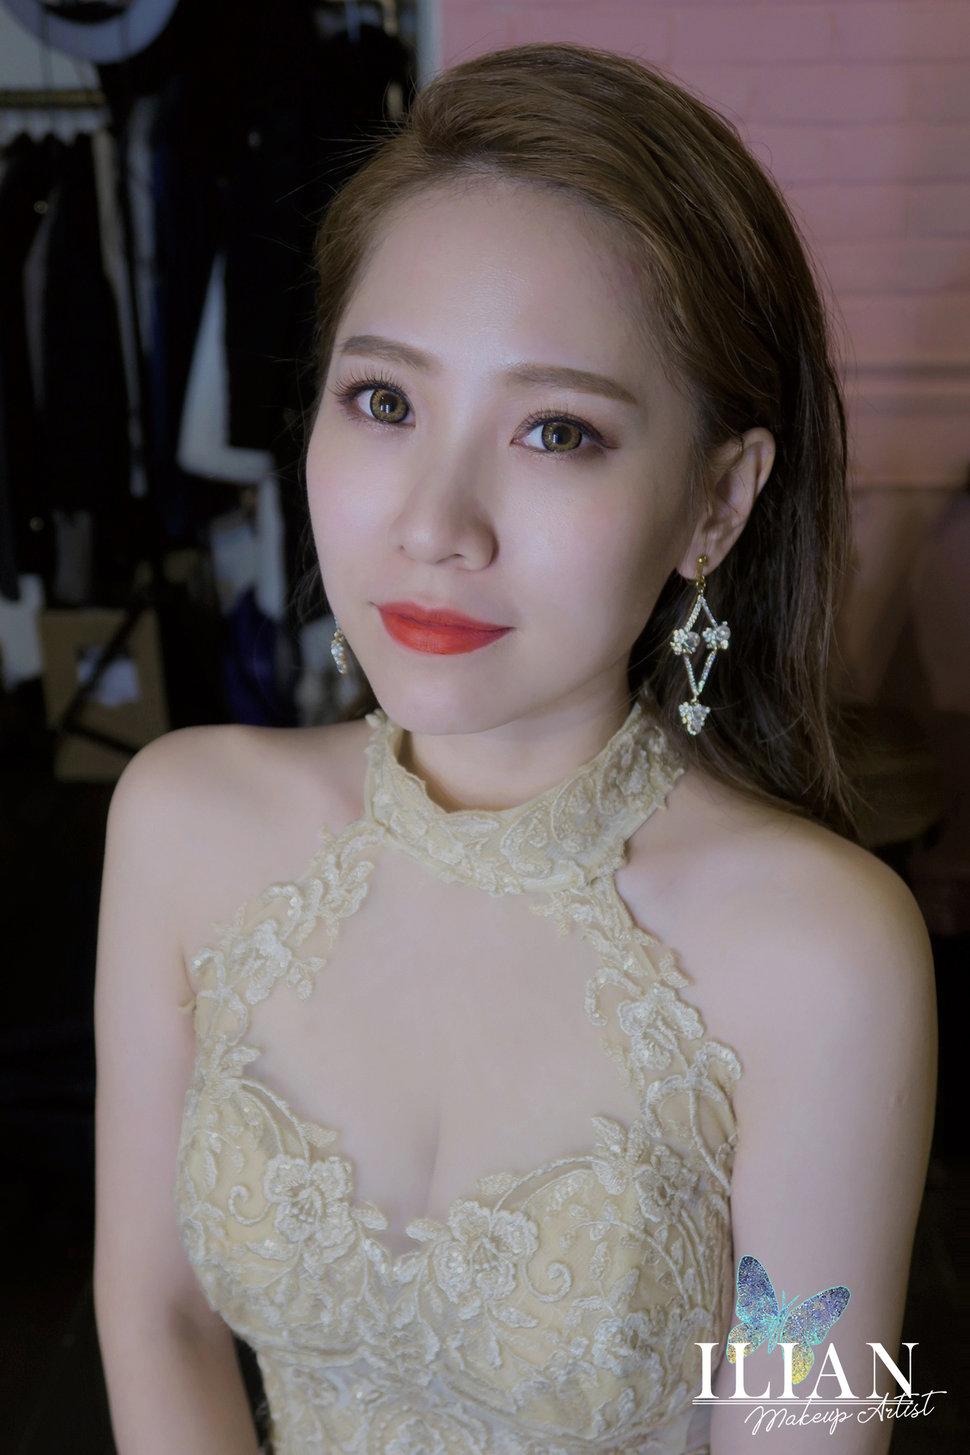 20191126174752_mh1574931511562 - ilian藍專業彩妝造型《結婚吧》